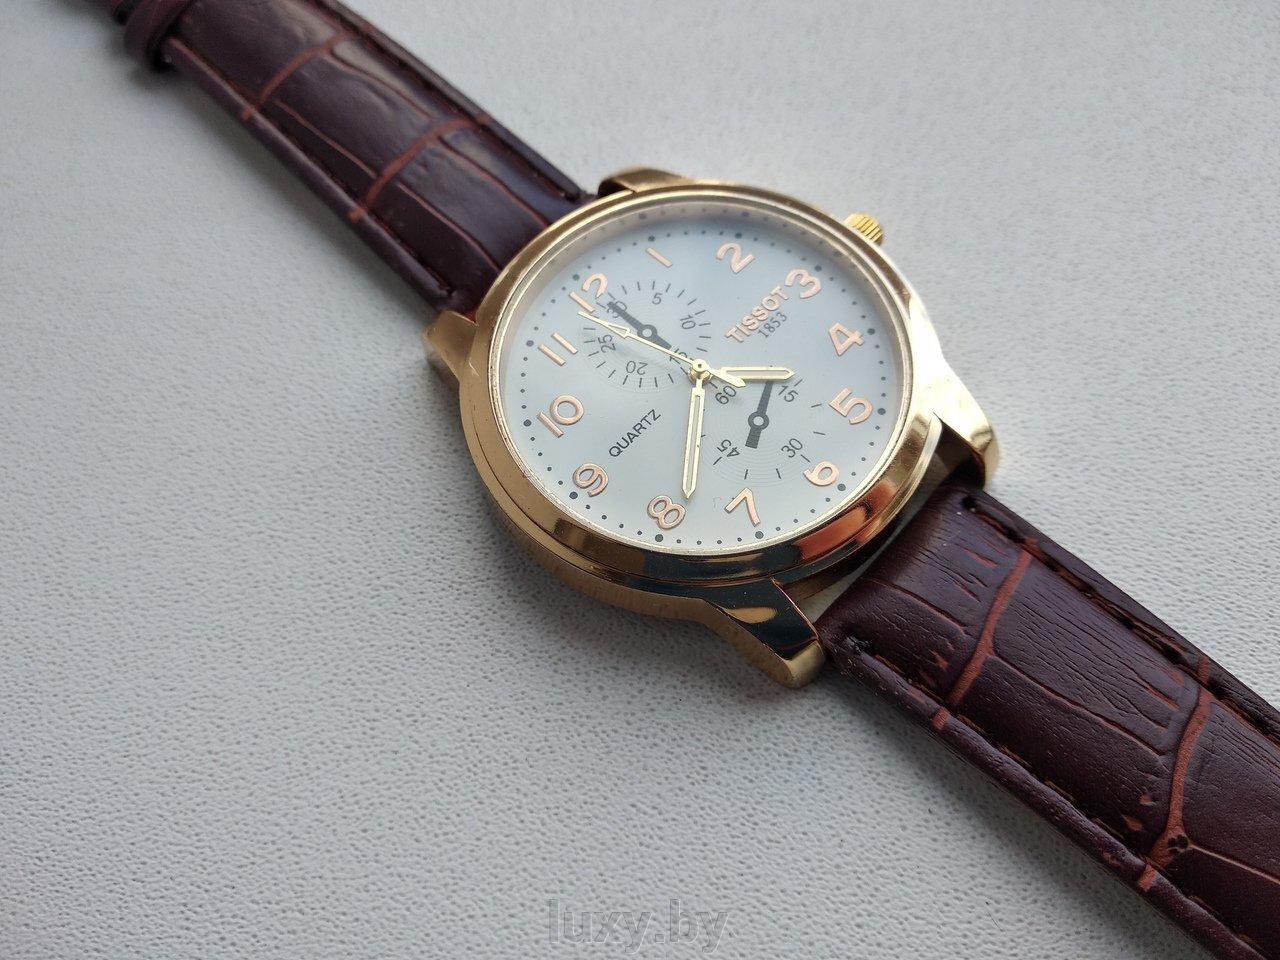 Часы наручные мужские, ремешок коричневый, арт. Н-45 - фото pic_d3f469325a8c24a_1920x9000_1.jpg